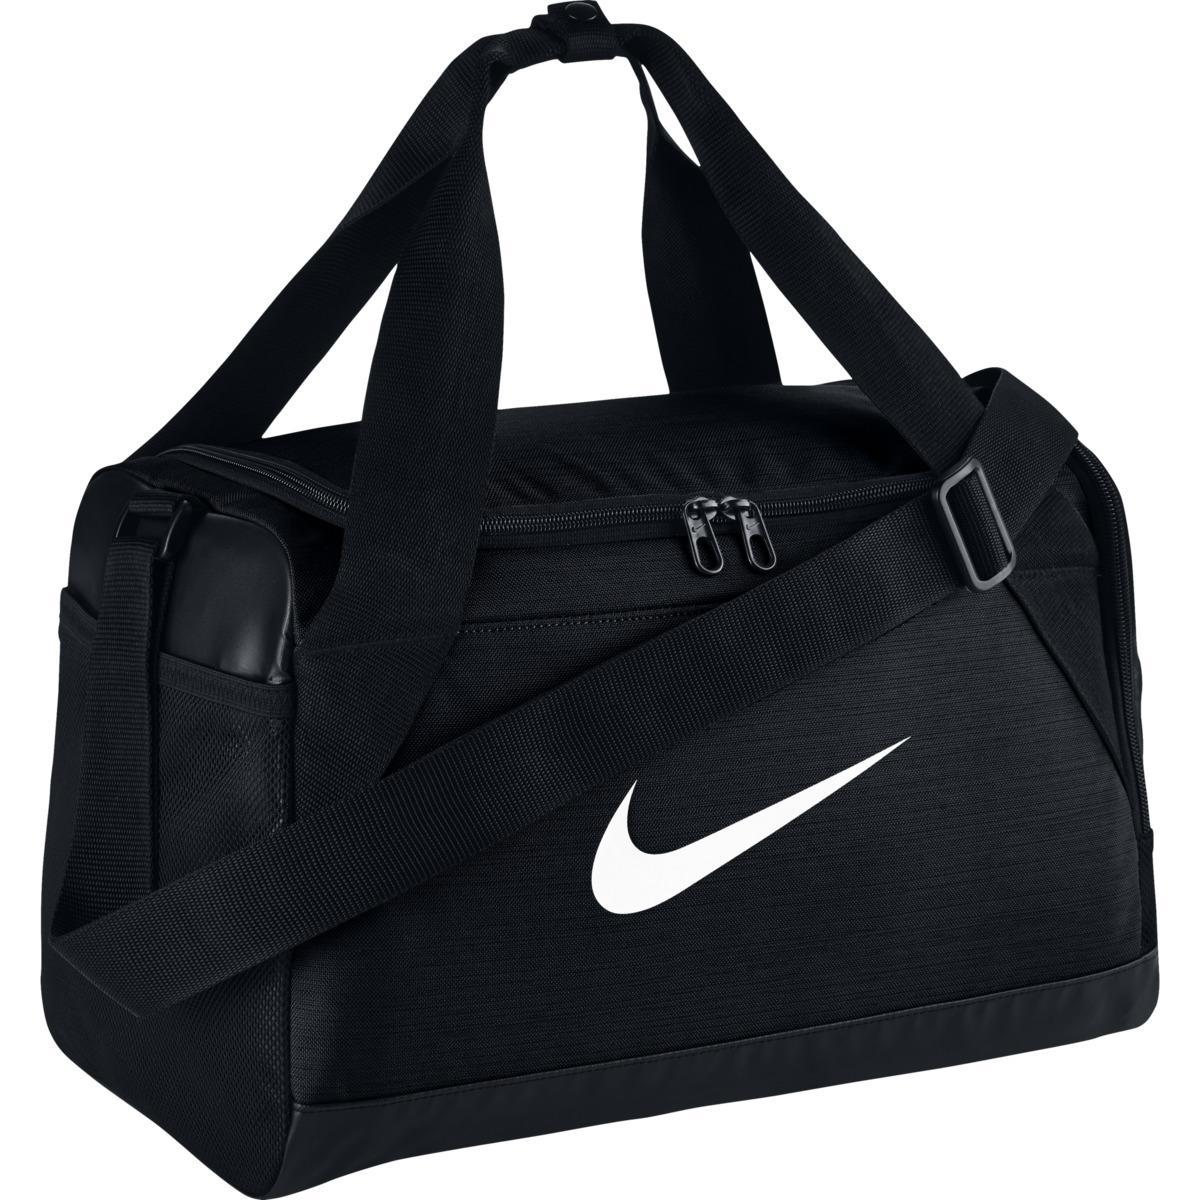 5e441b6907 Nike - Black Brasilia Xs Sports Bag for Men - Lyst. View fullscreen